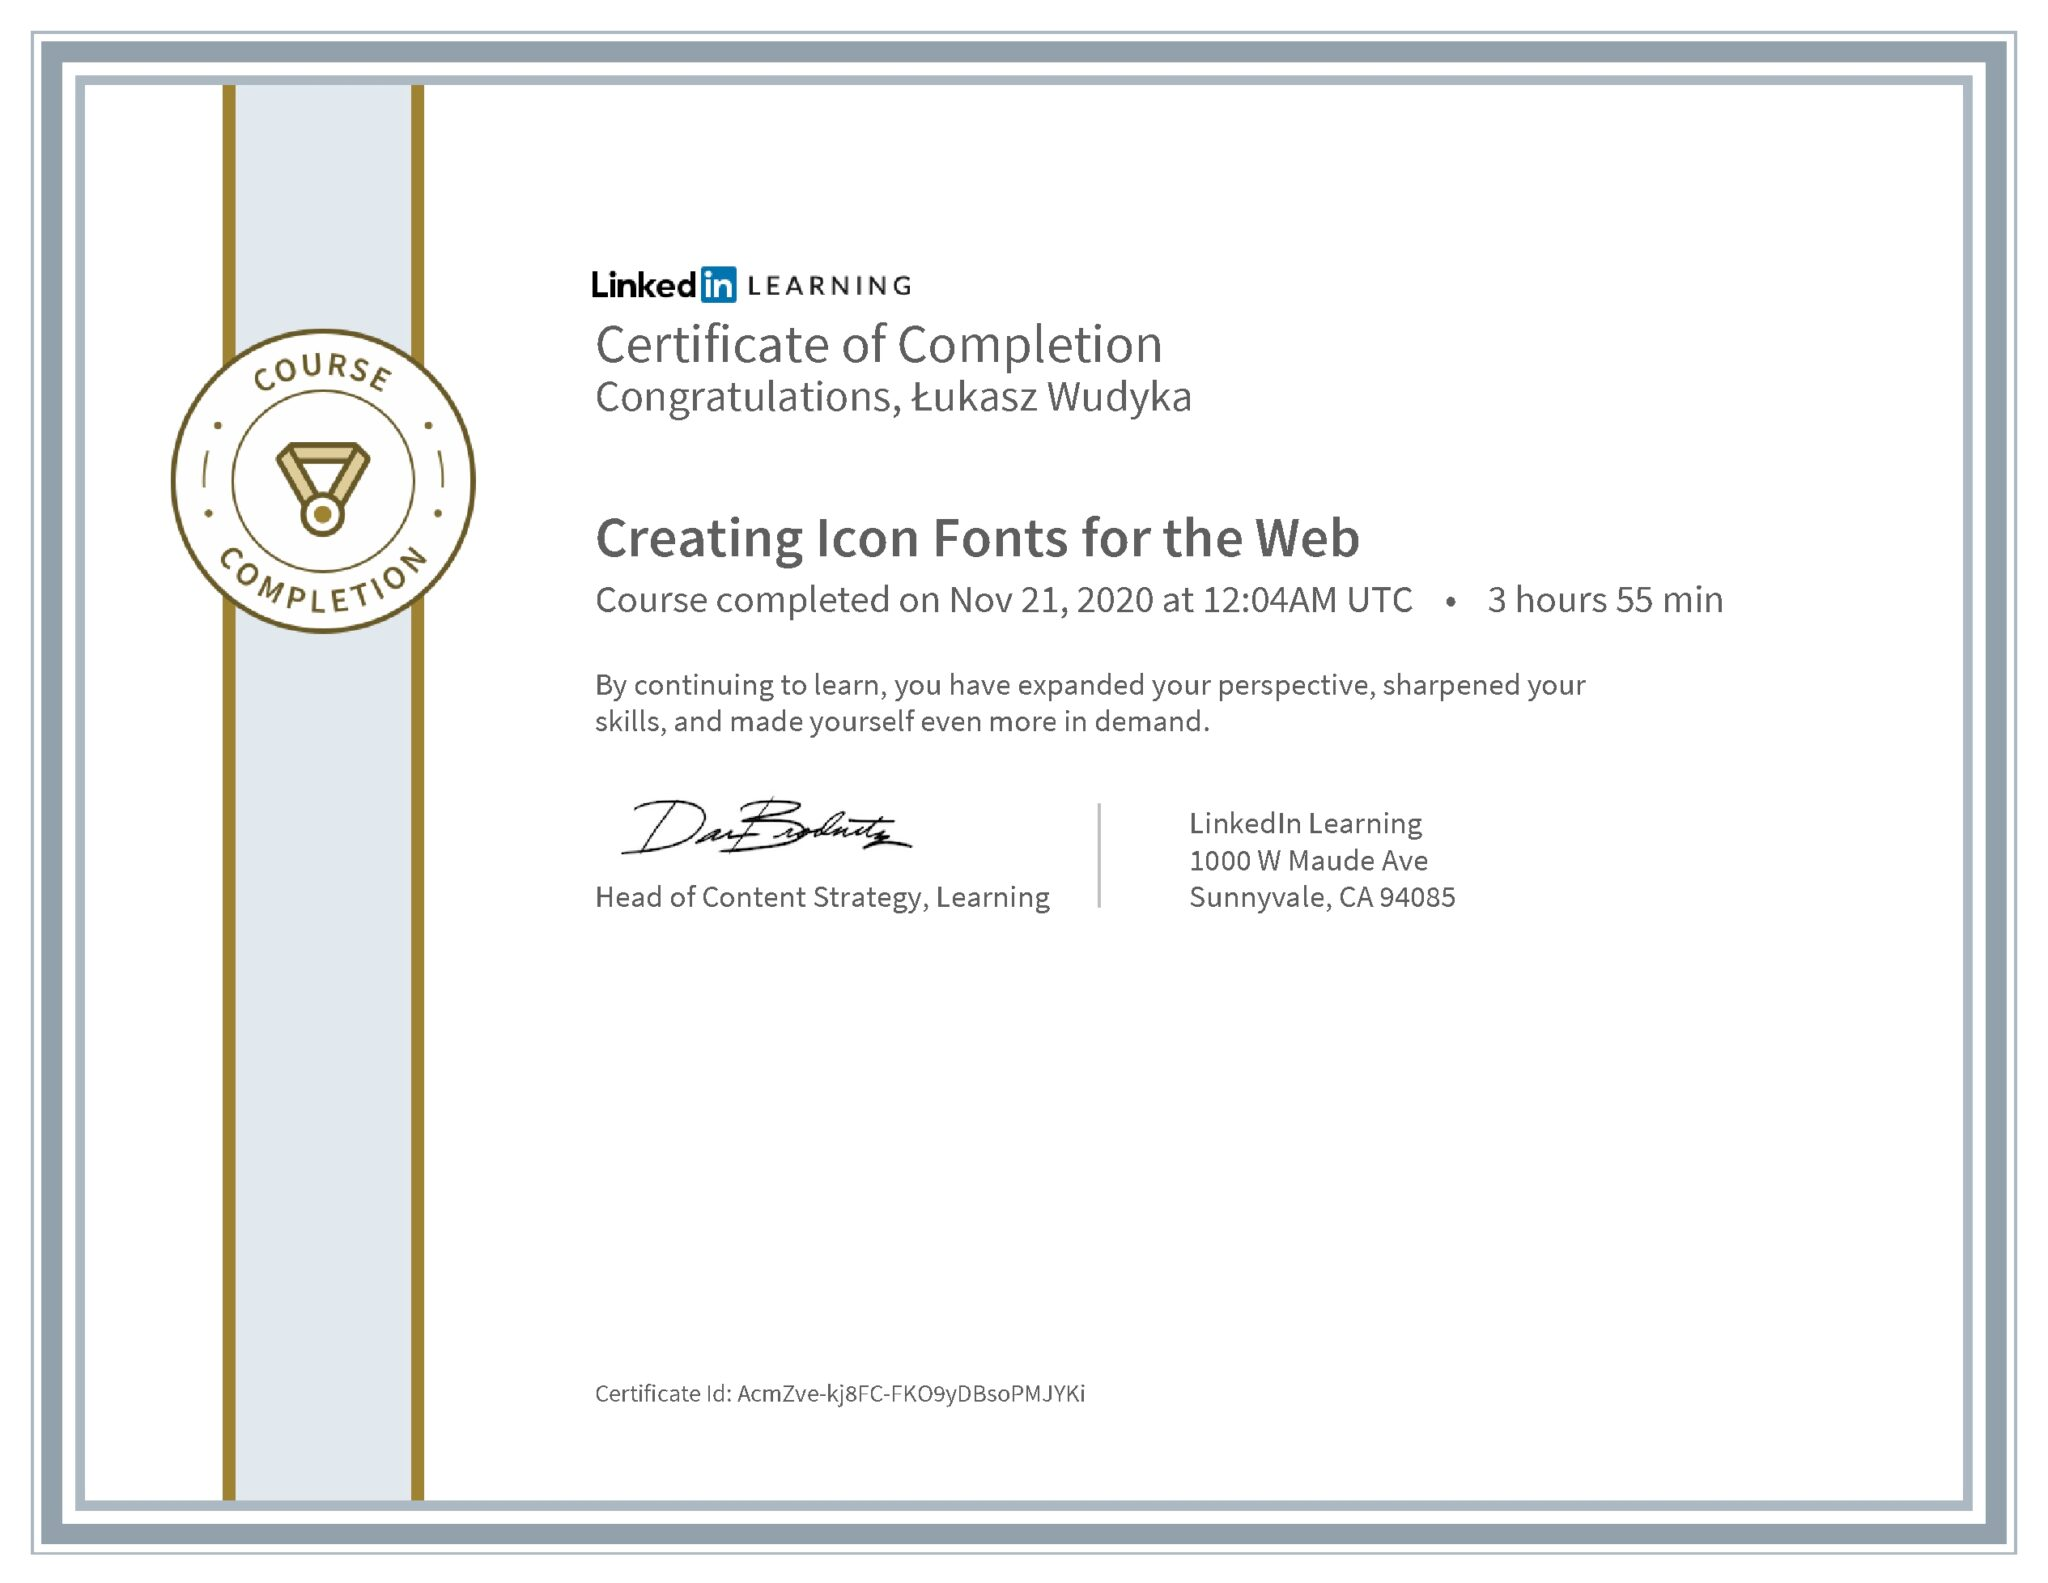 Łukasz Wudyka certyfikat LinkedIn Creating Icon Fonts for the Web